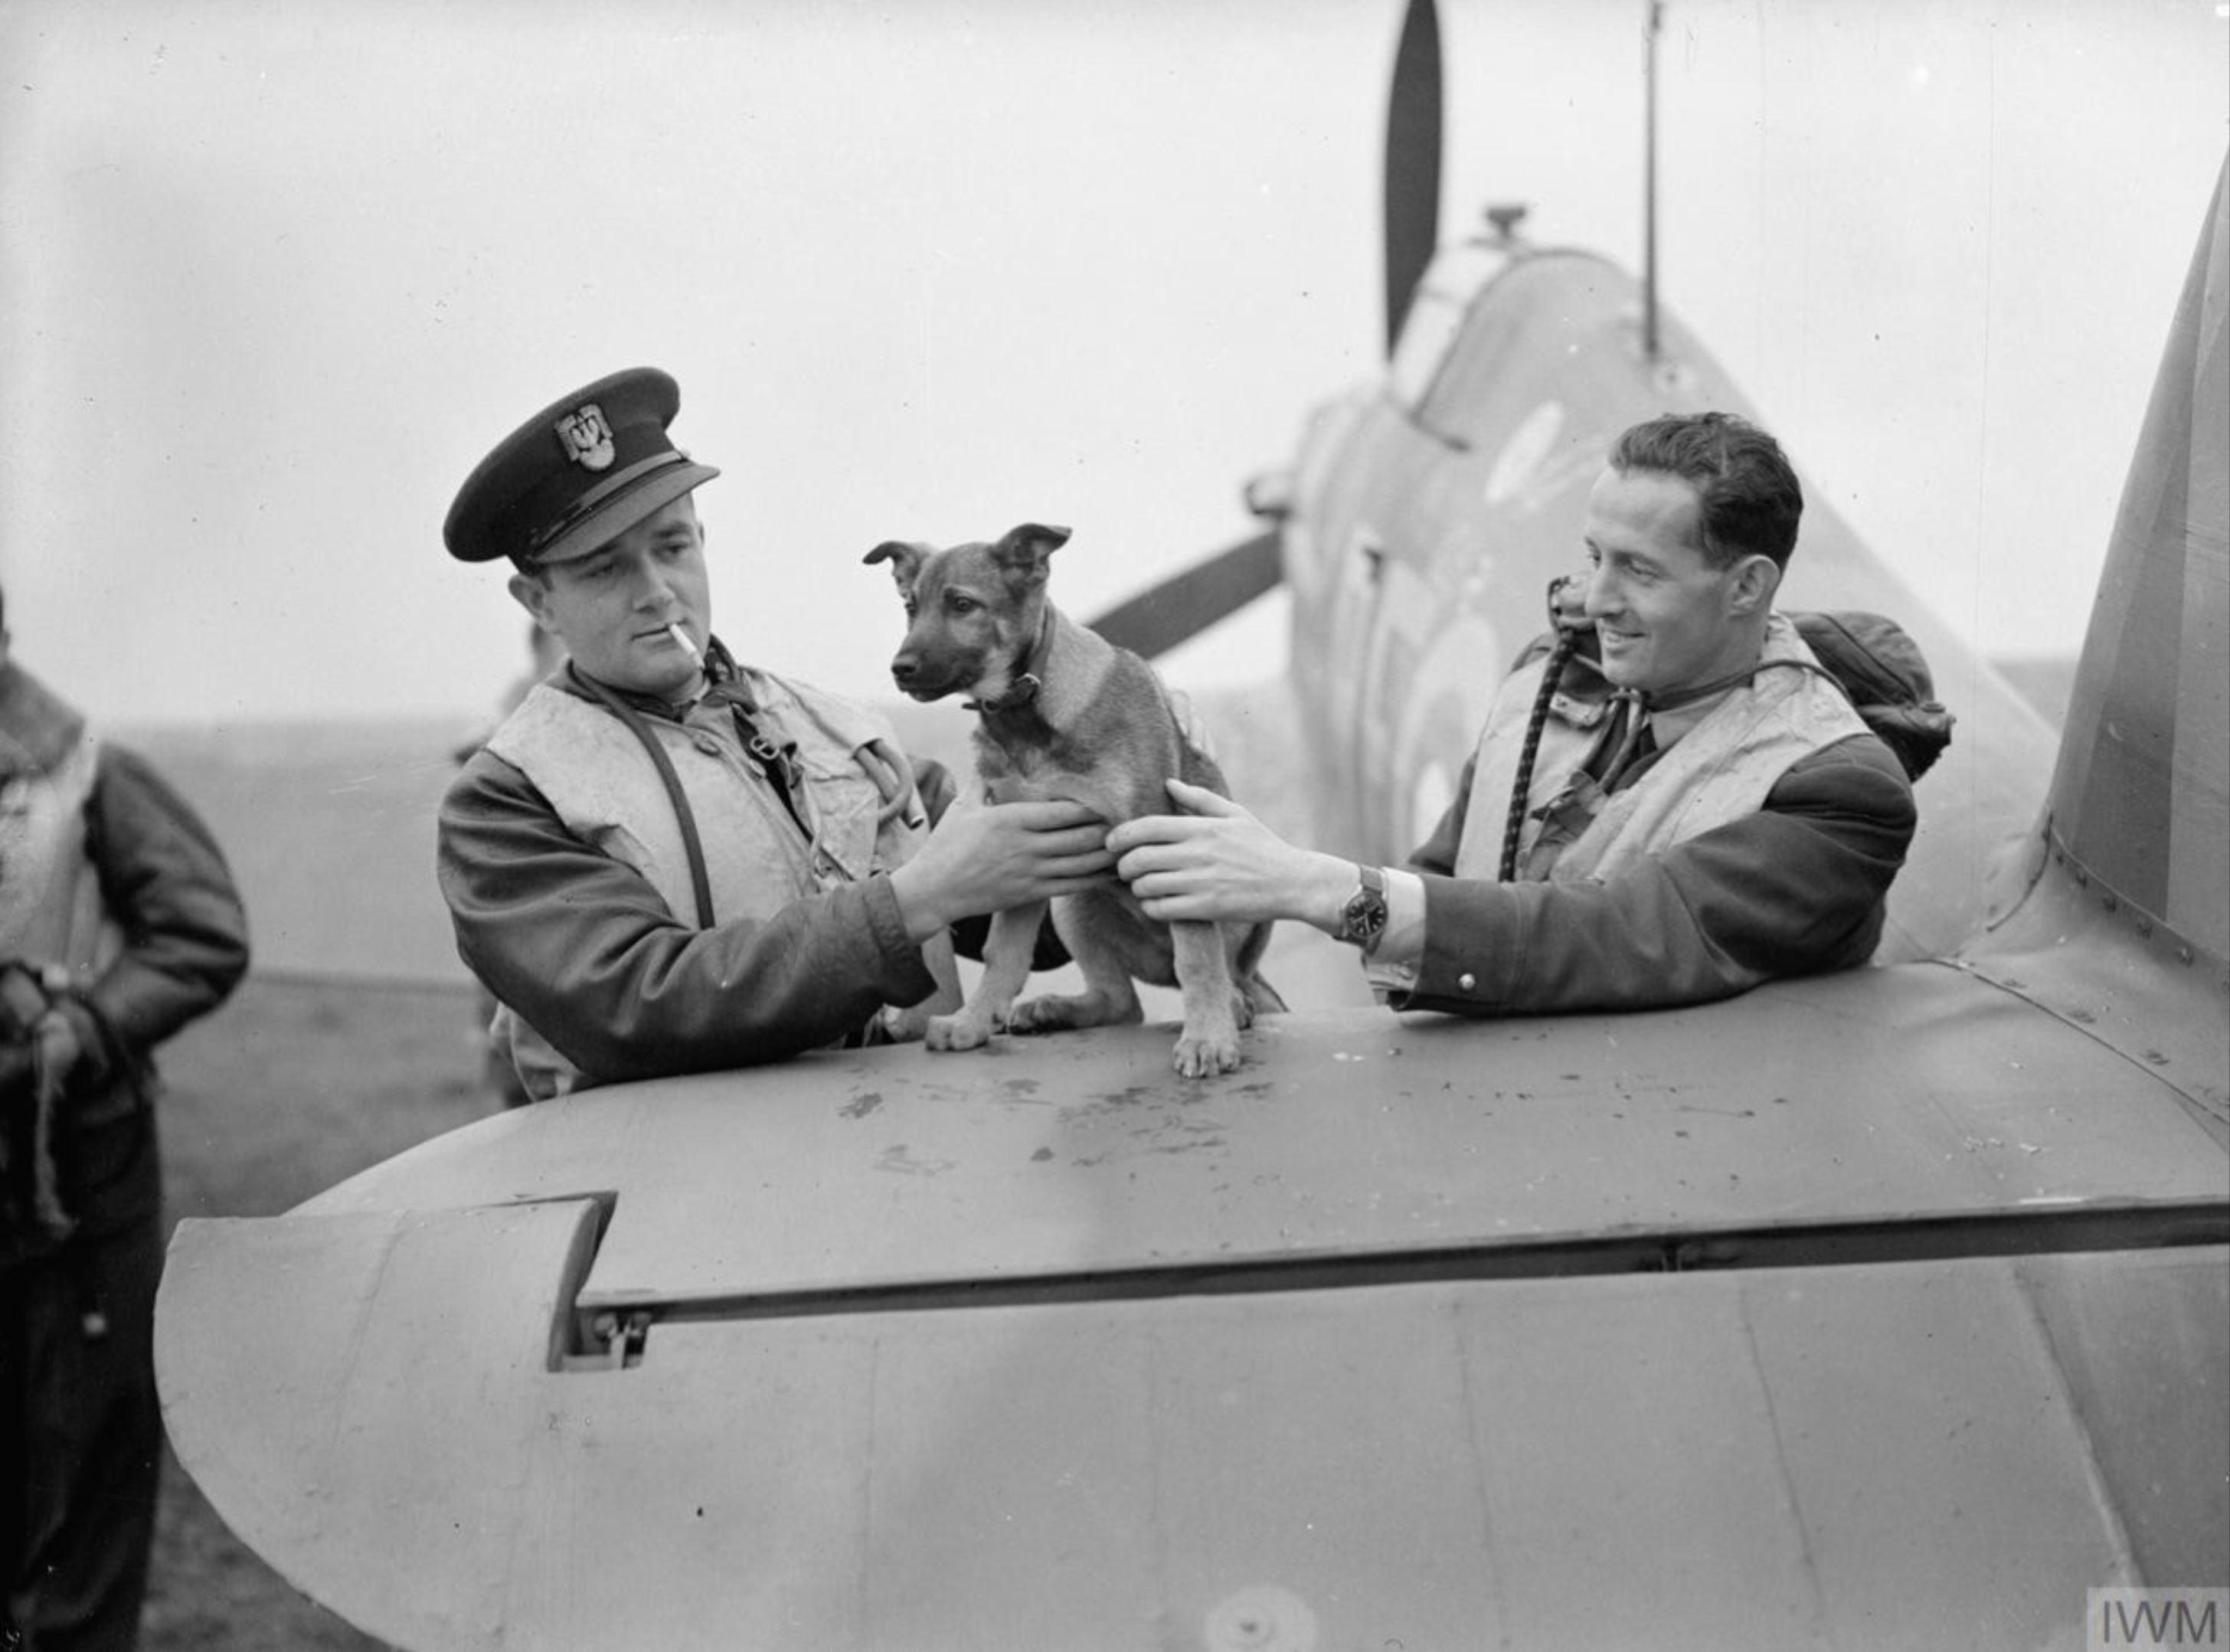 Aircrew RAF 303Sqn (Polish) pilots at RAF Leconfield Yorkshire 24th Oct 1940 IWM CH1537